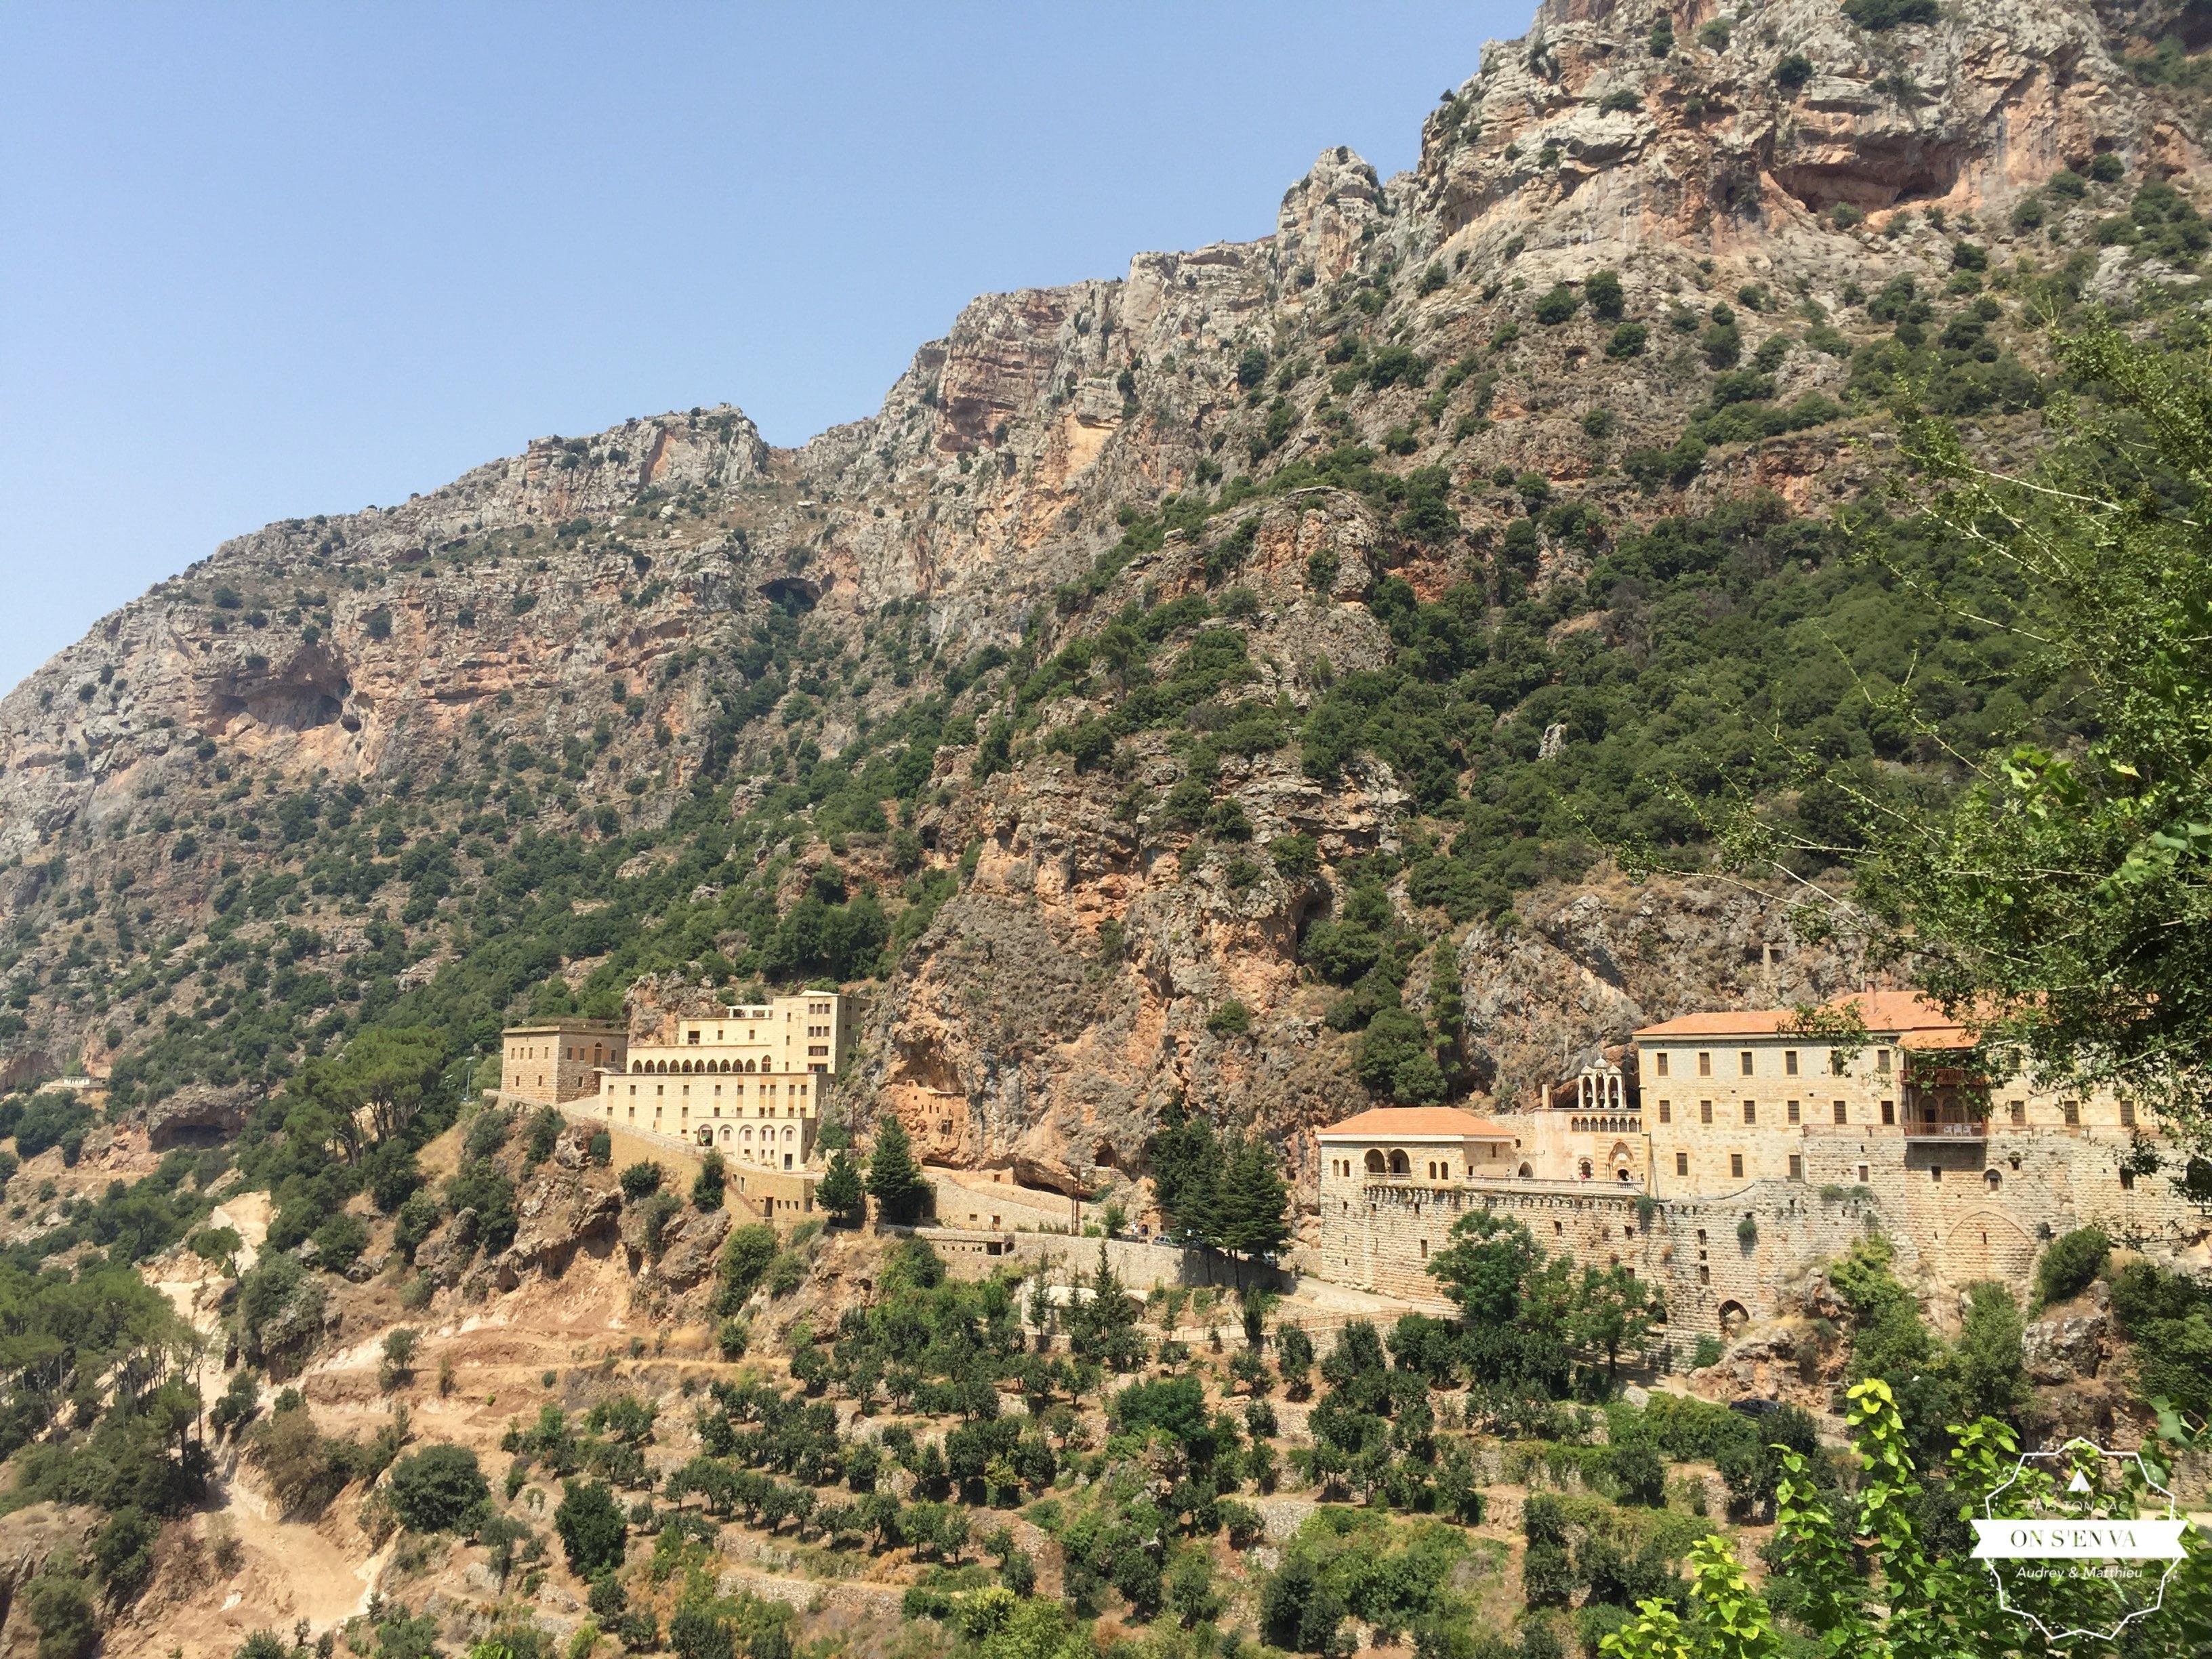 On aperçoit le Monastère St Antoine